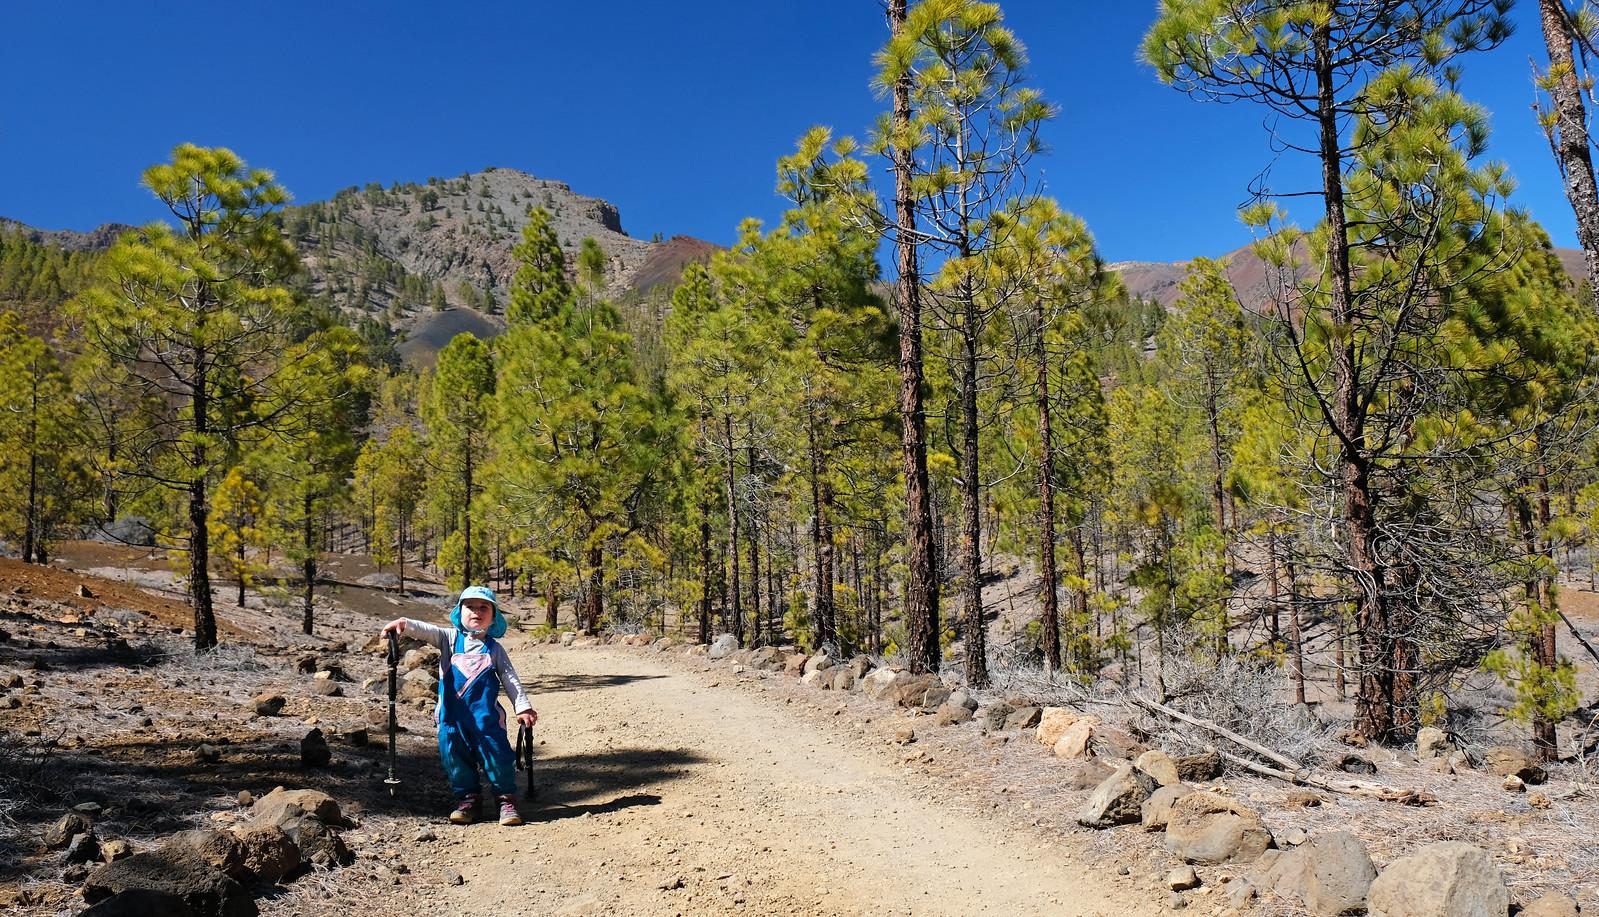 Corona forestal, Tenerife, Canary Islands, Spain